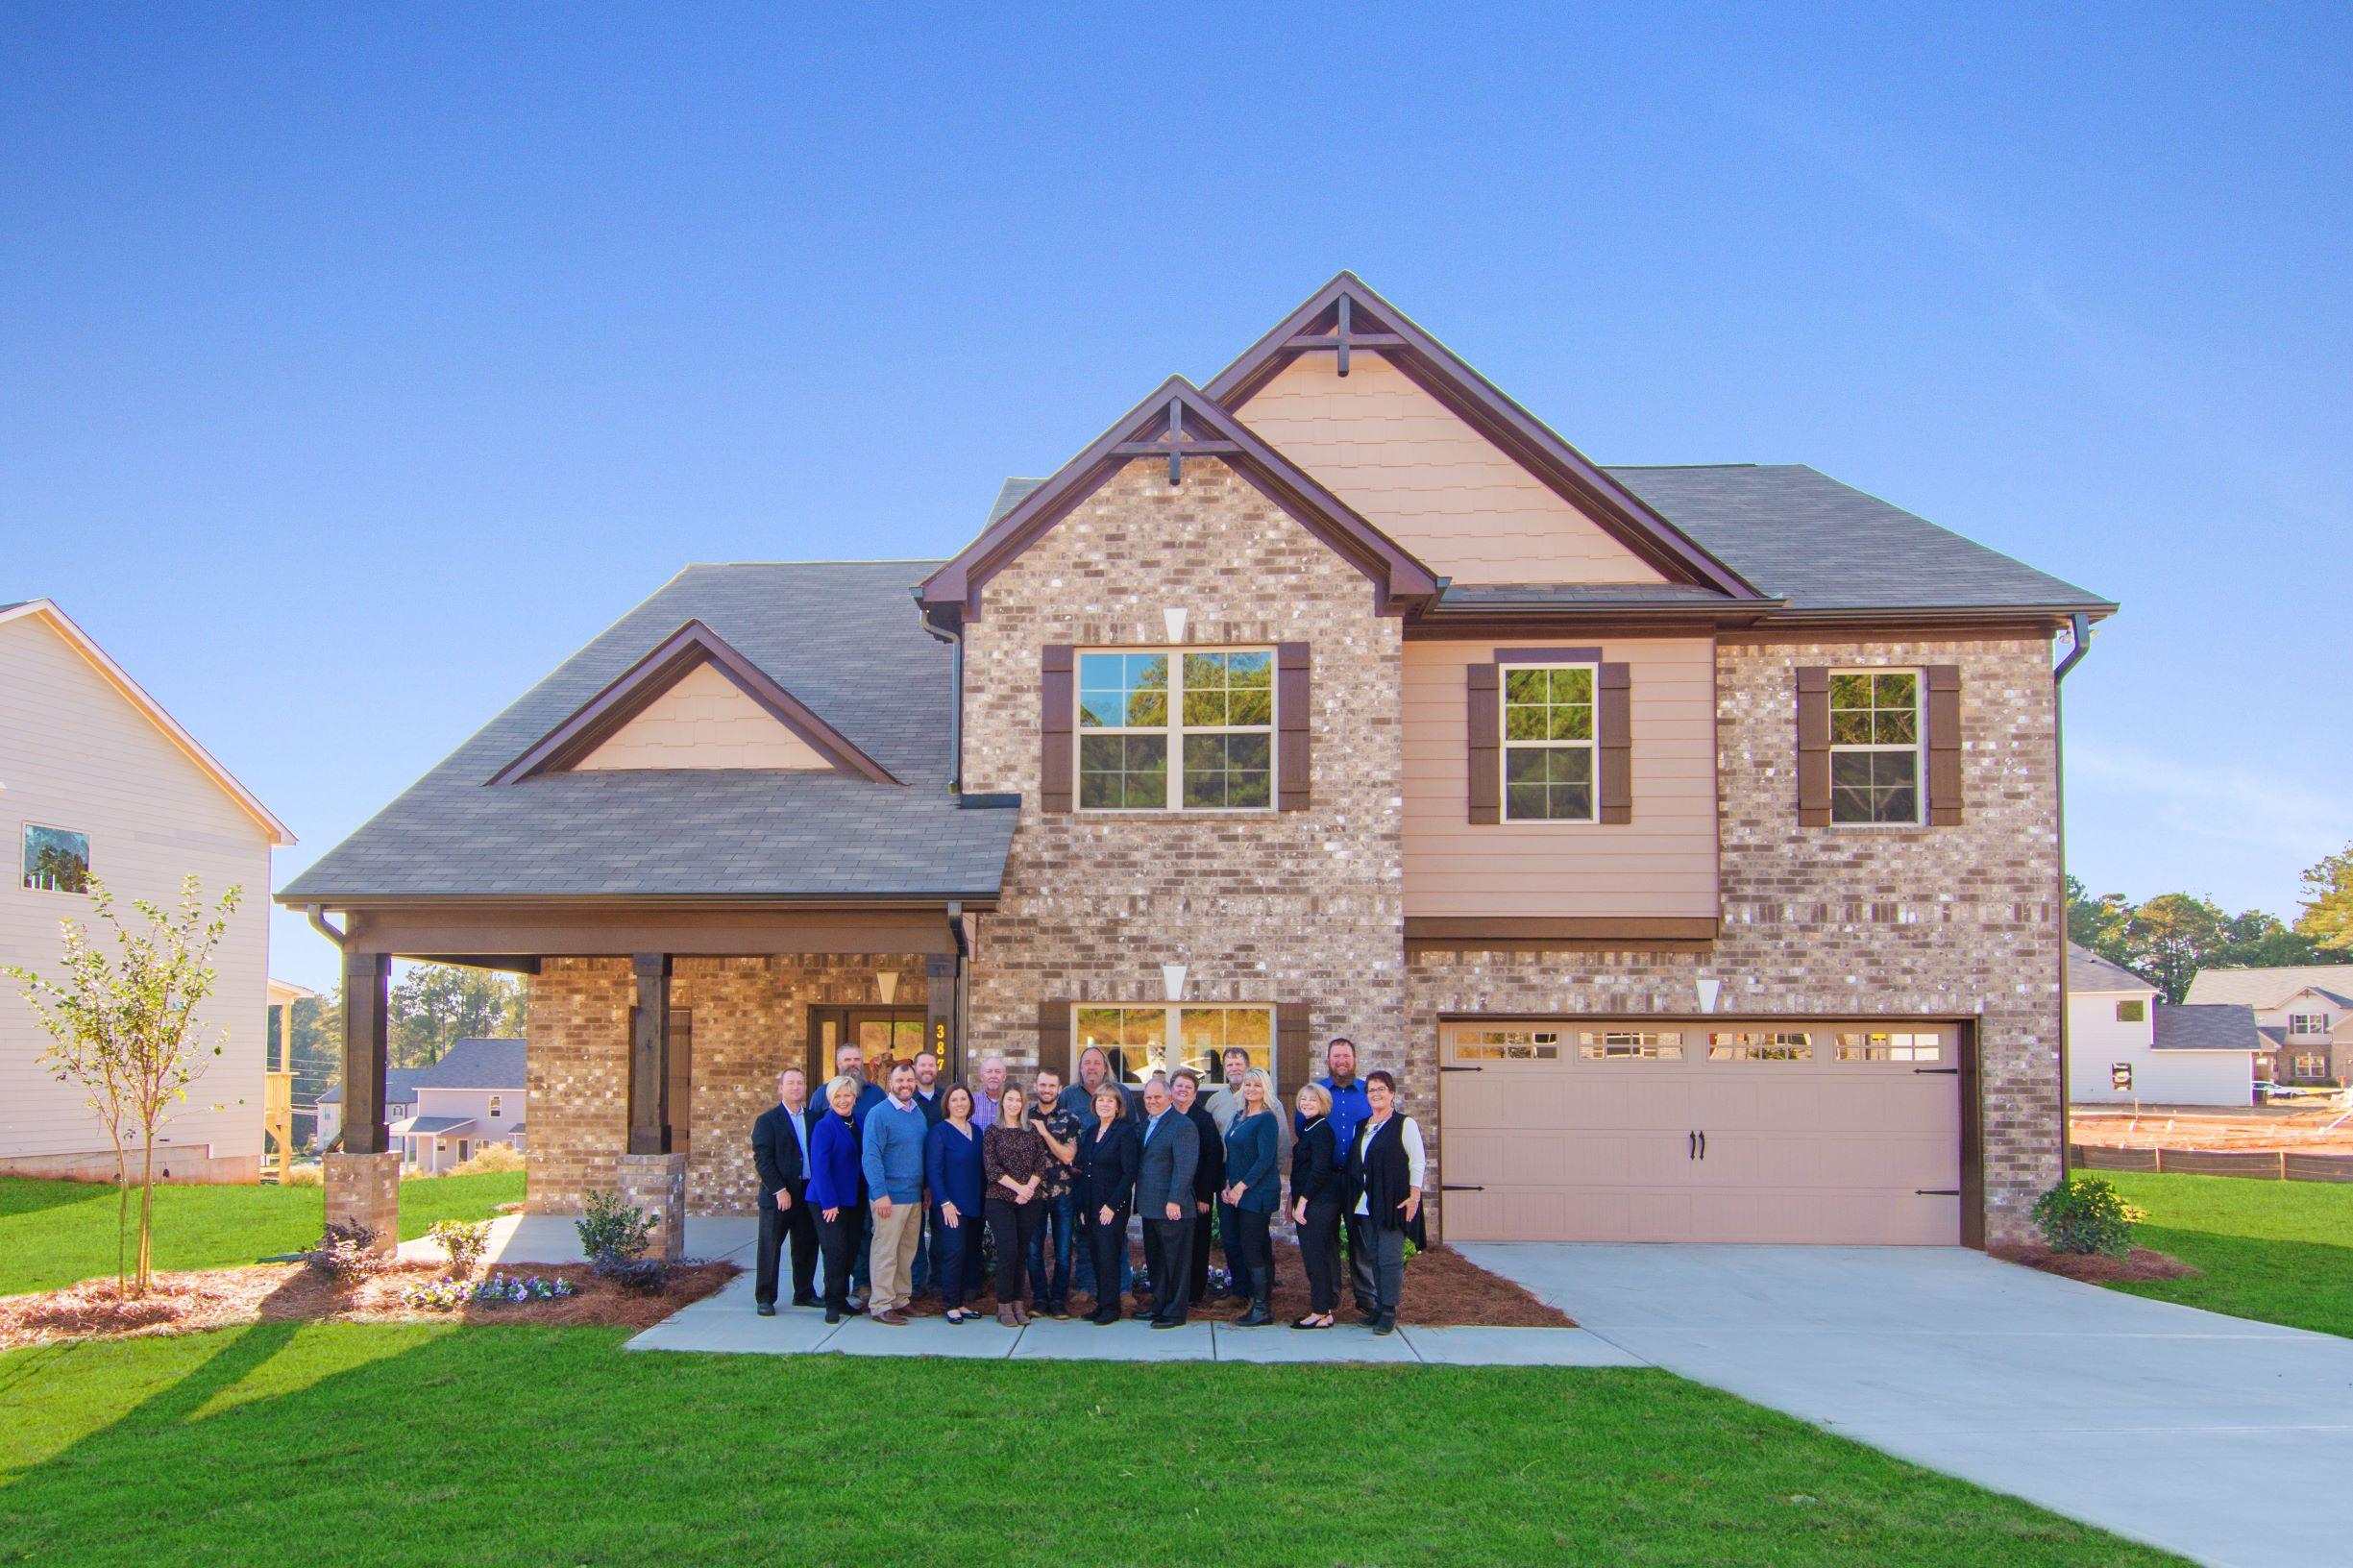 Richardson Housing Group